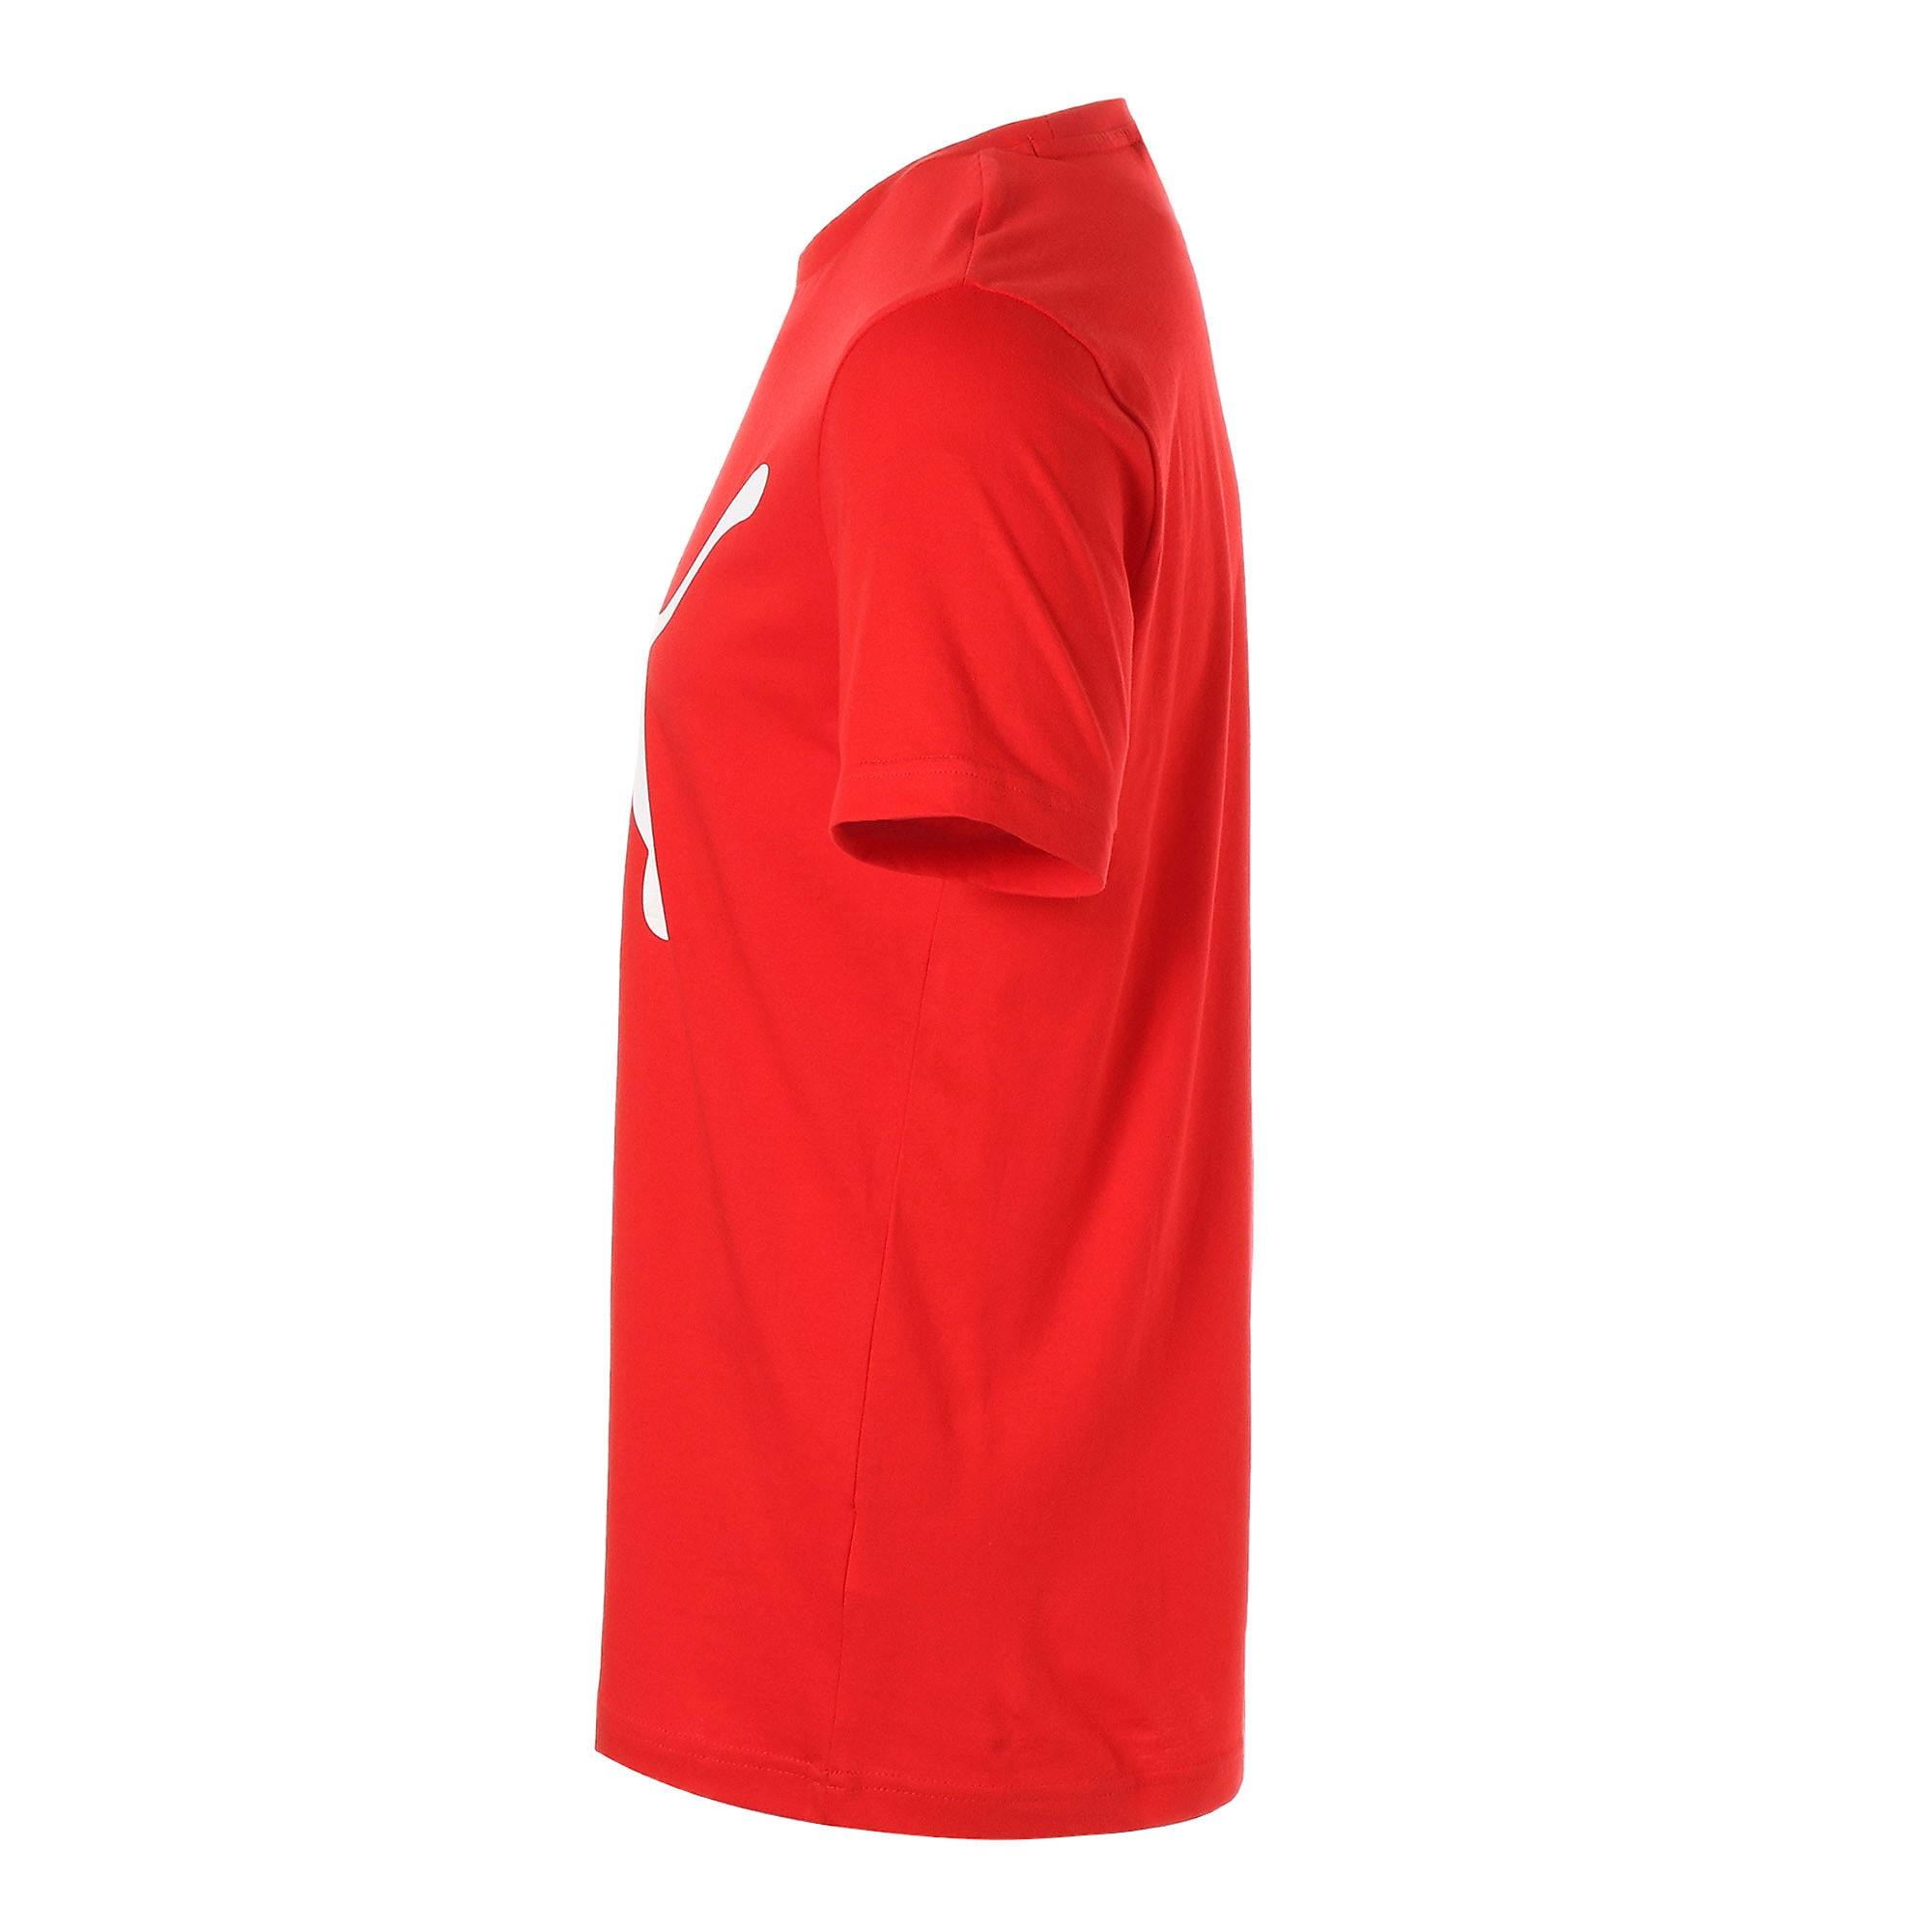 Thumbnail 5 of CLASSICS ロゴ SS Tシャツ 半袖, High Risk Red, medium-JPN